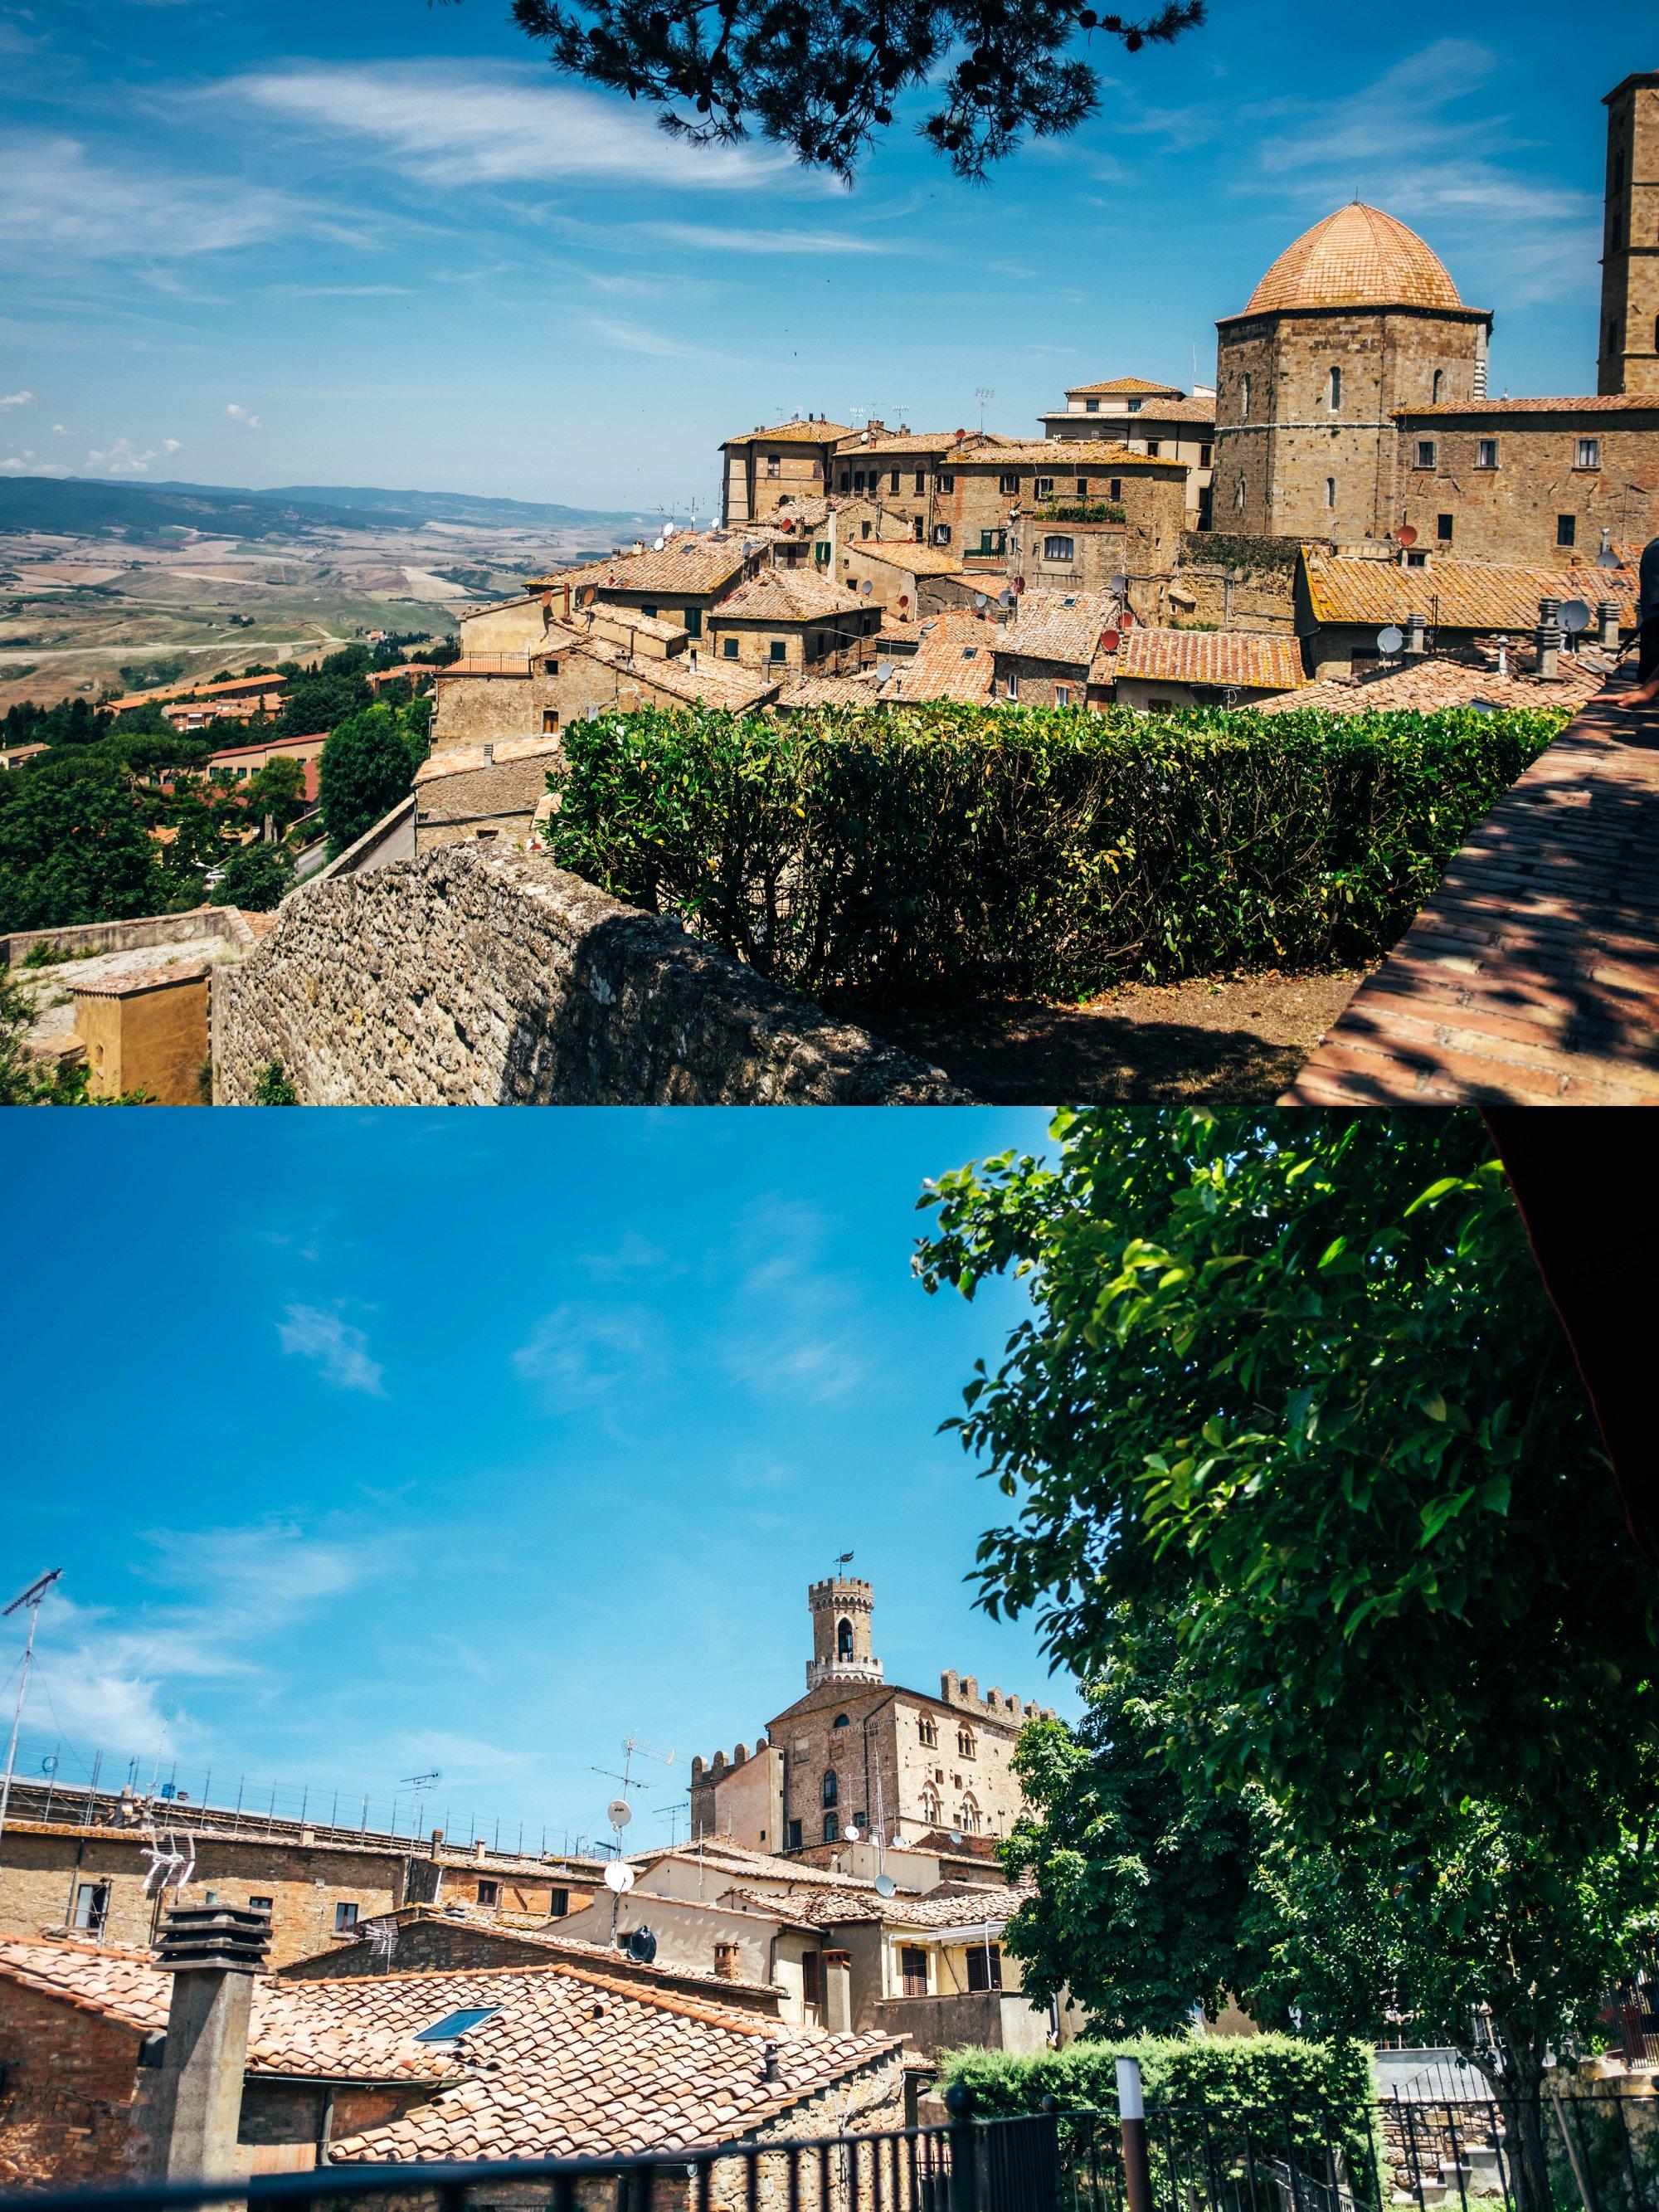 Volterra Rooftops Tuscany Essex Documentary Wedding Travel Photographer